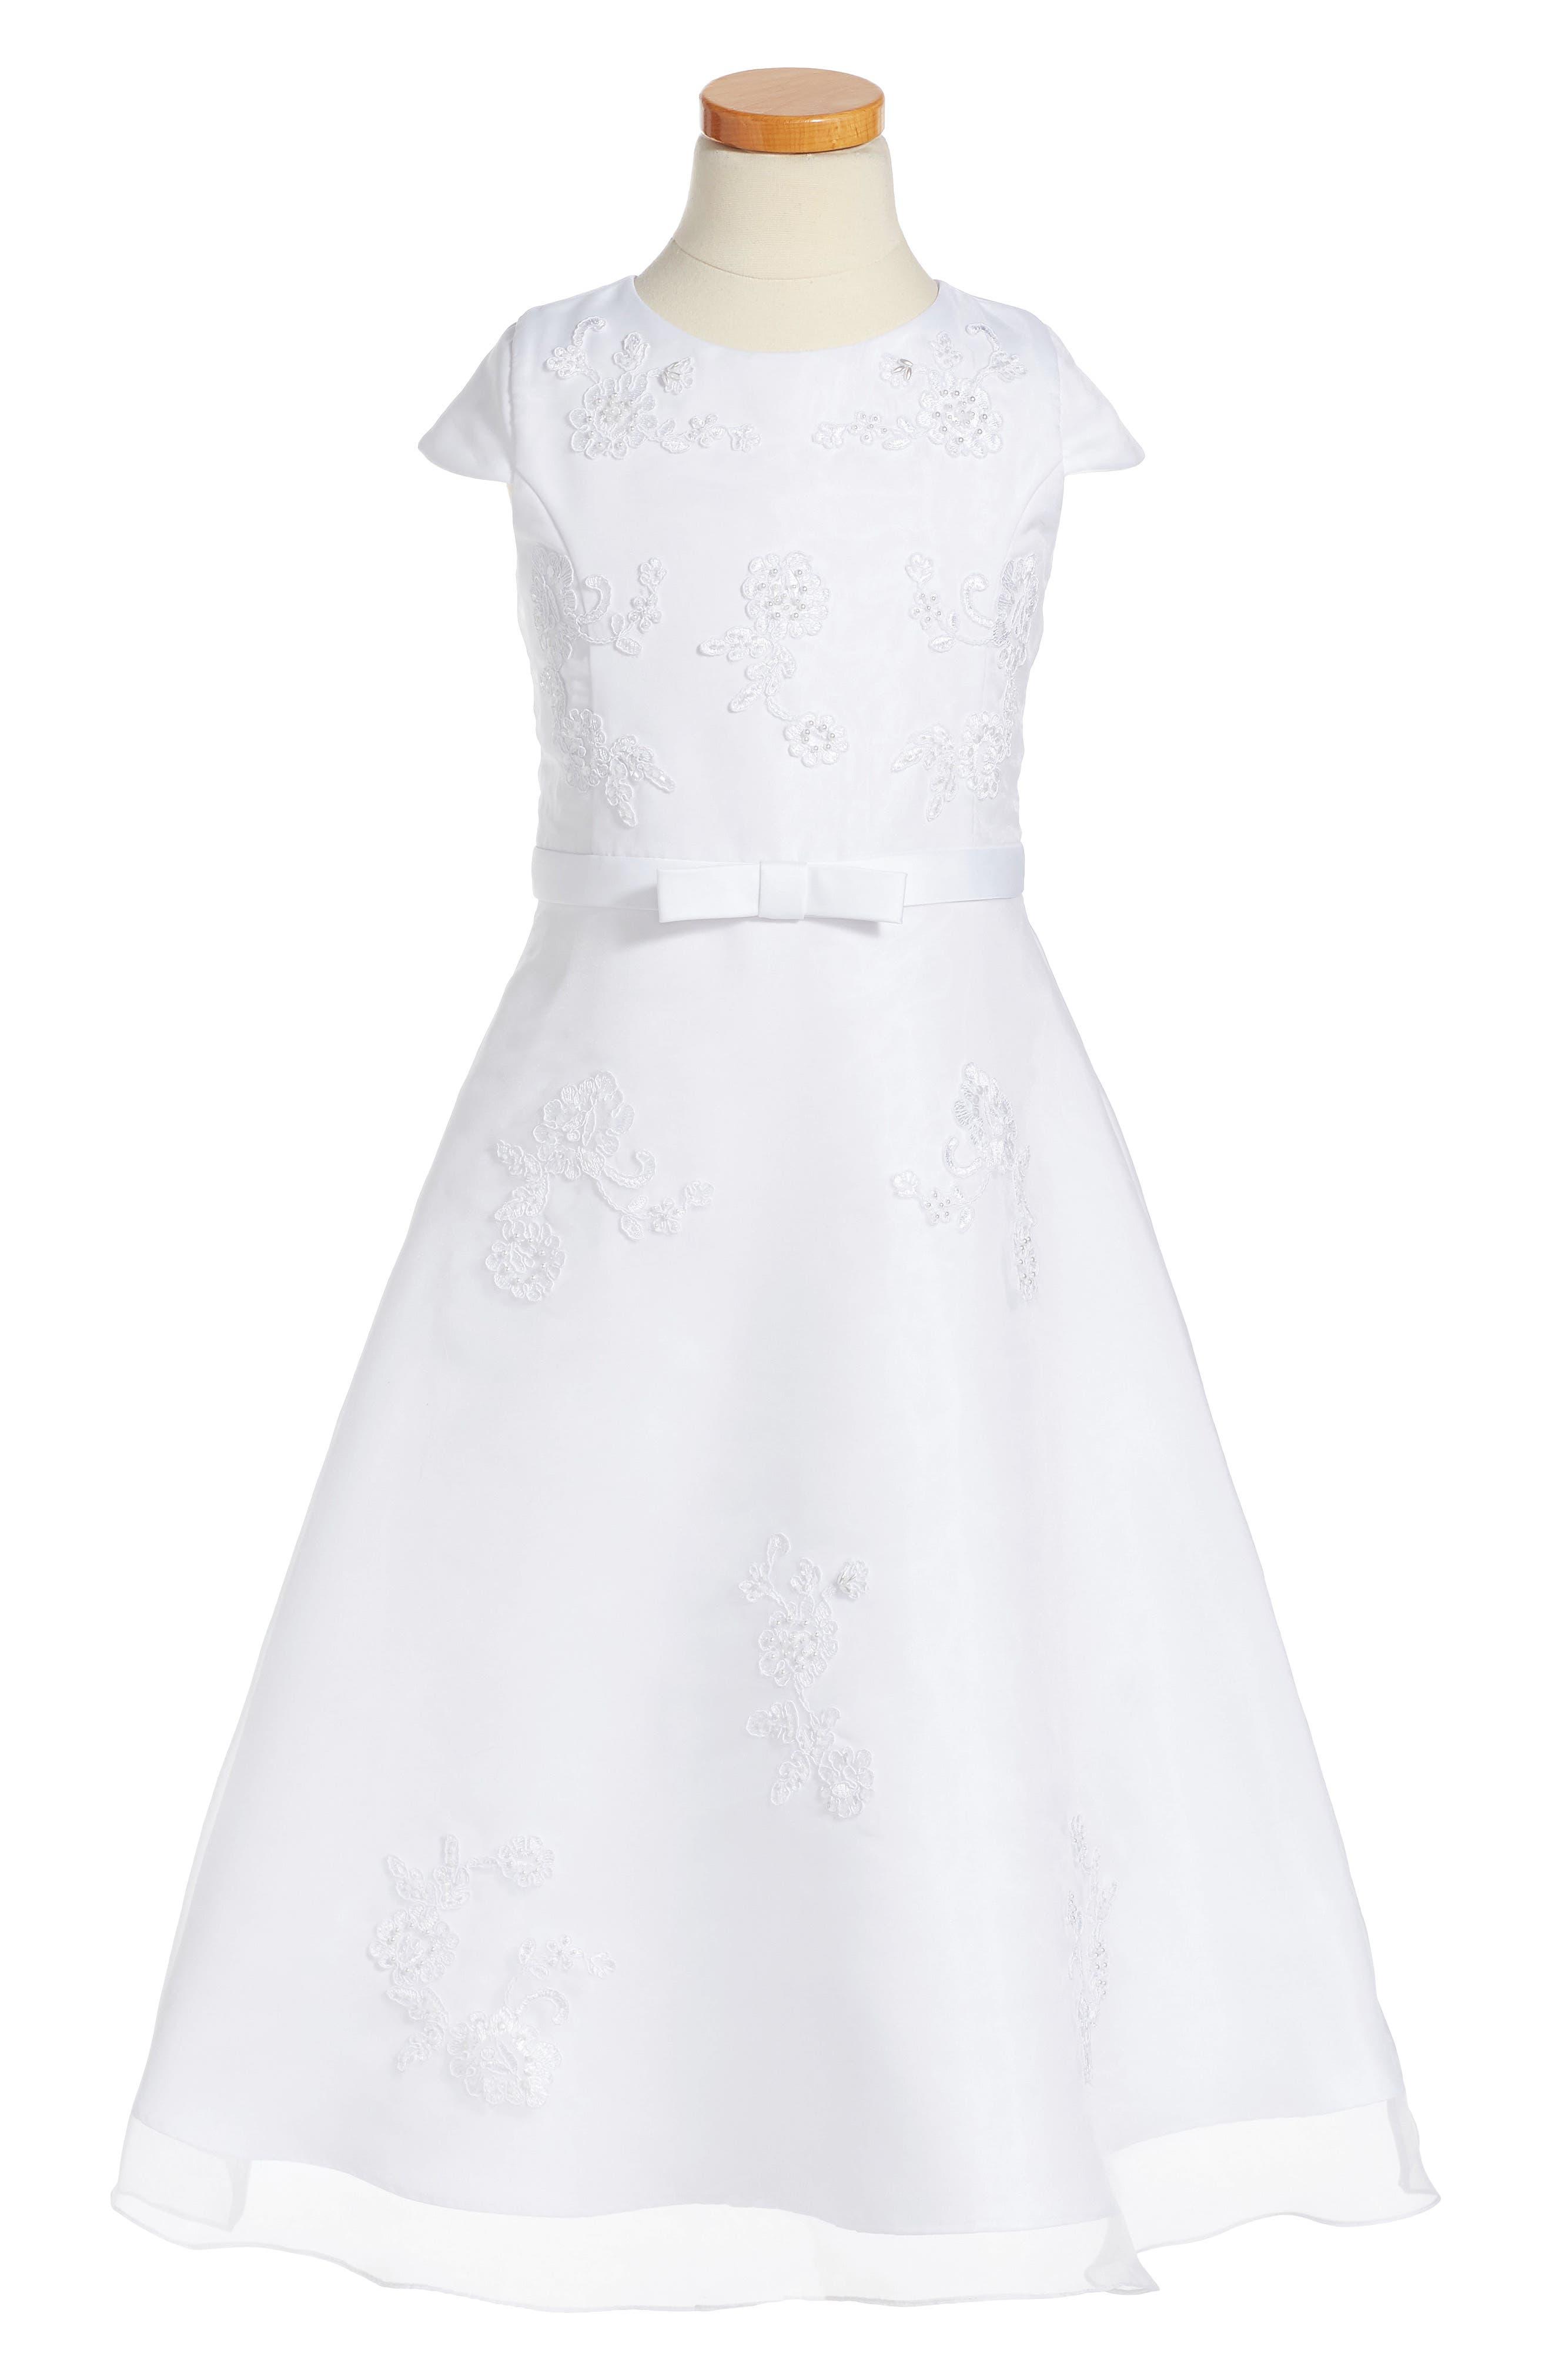 Alternate Image 1 Selected - Us Angels Lace Floral Fit & Flare Dress (Little Girls & Big Girls)